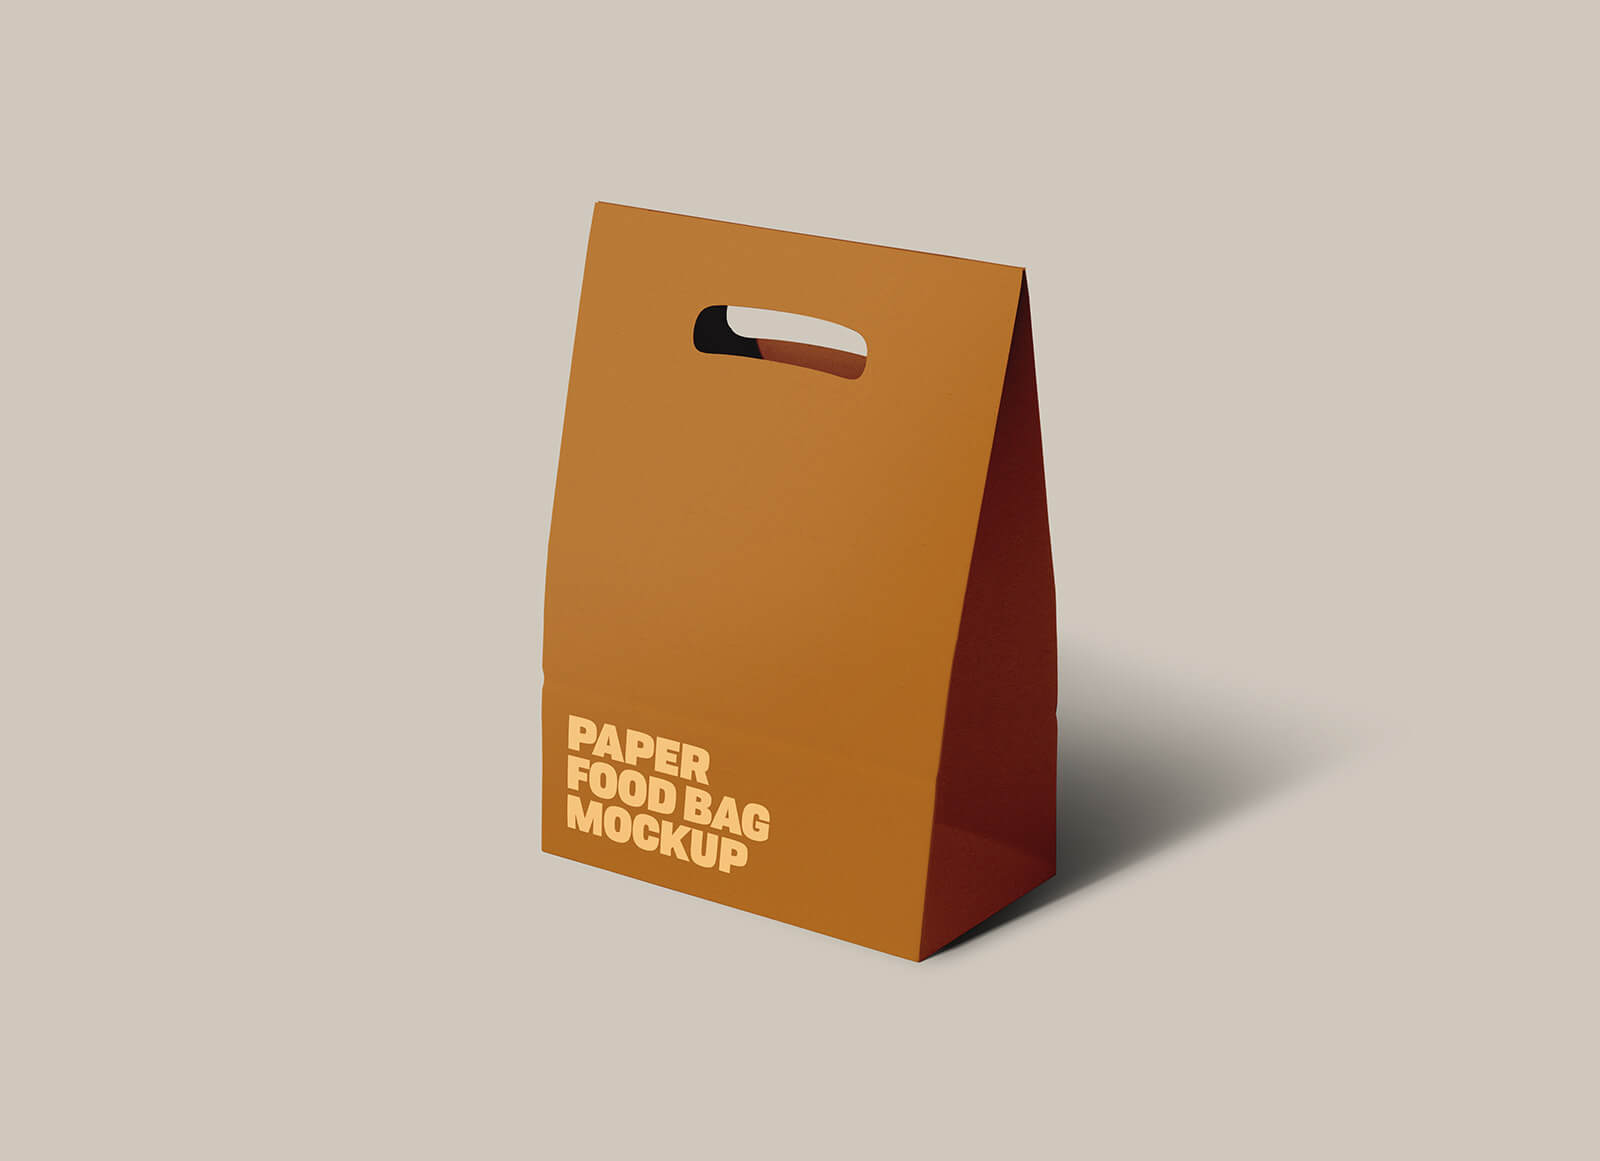 Free-Disposable-Kraft-Paper-Carry-Bag-Mockup-PSD